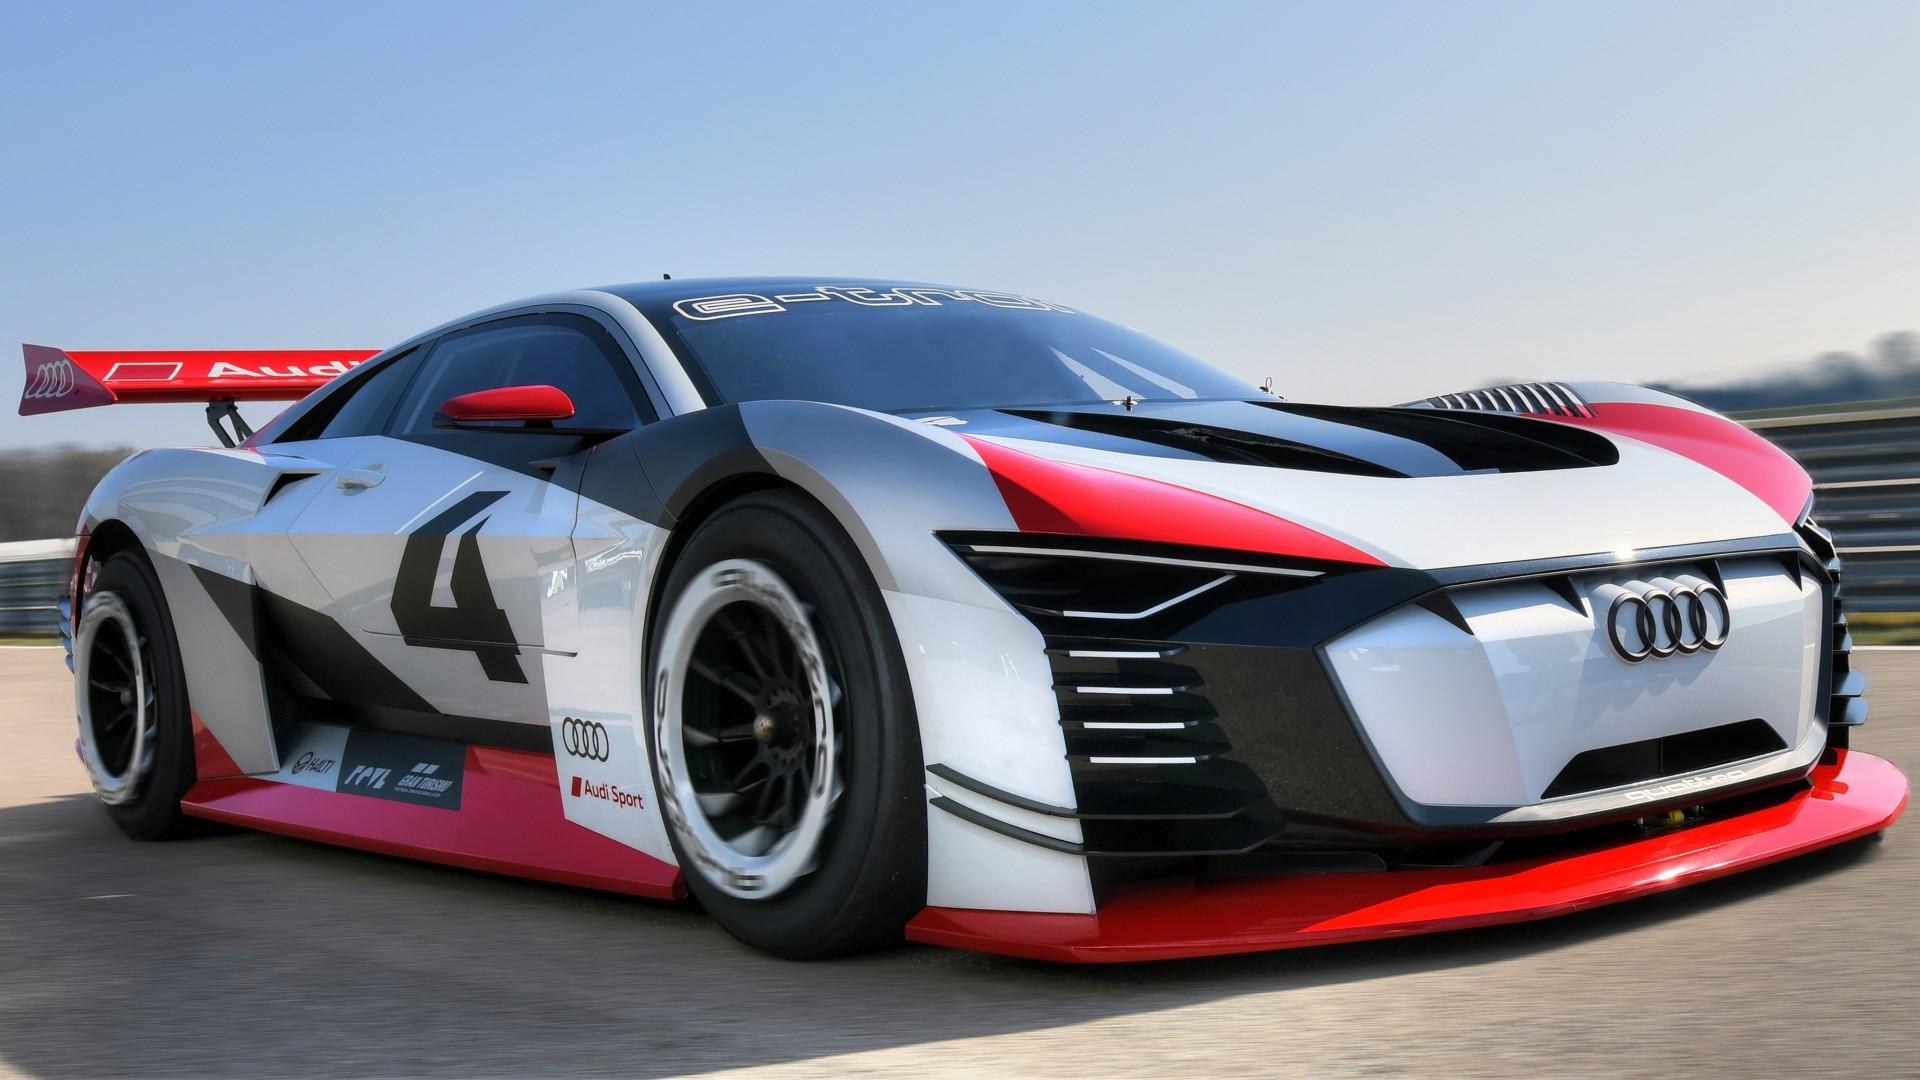 2018 Audi e tron Vision Gran Turismo 4K Wallpaper | HD Car ...